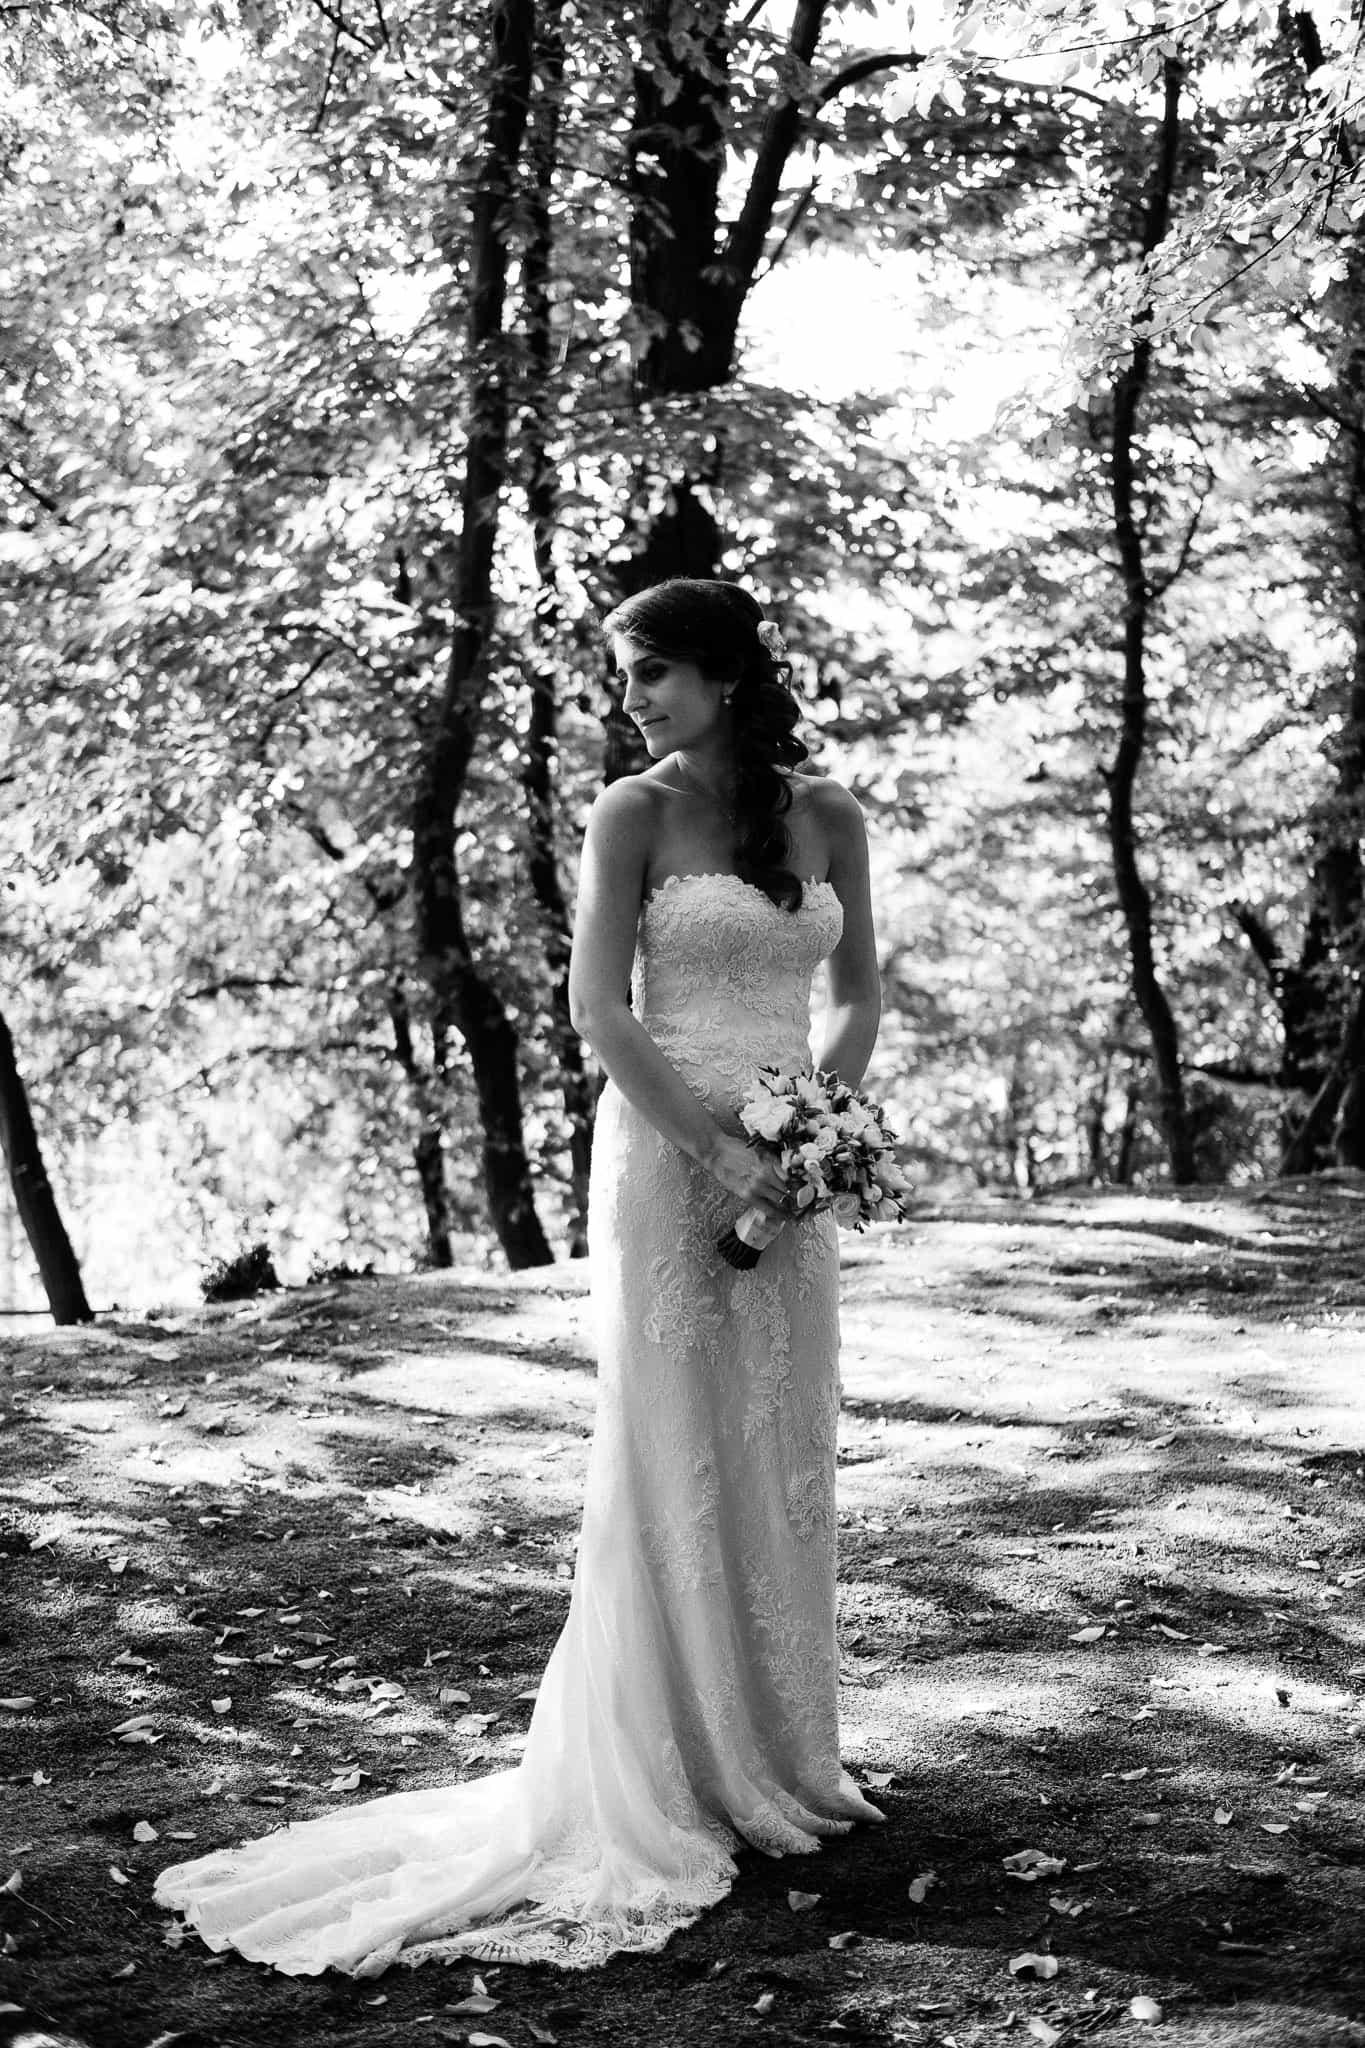 fotografo matrimonio cascina diodona varese lucarossifoto 00017